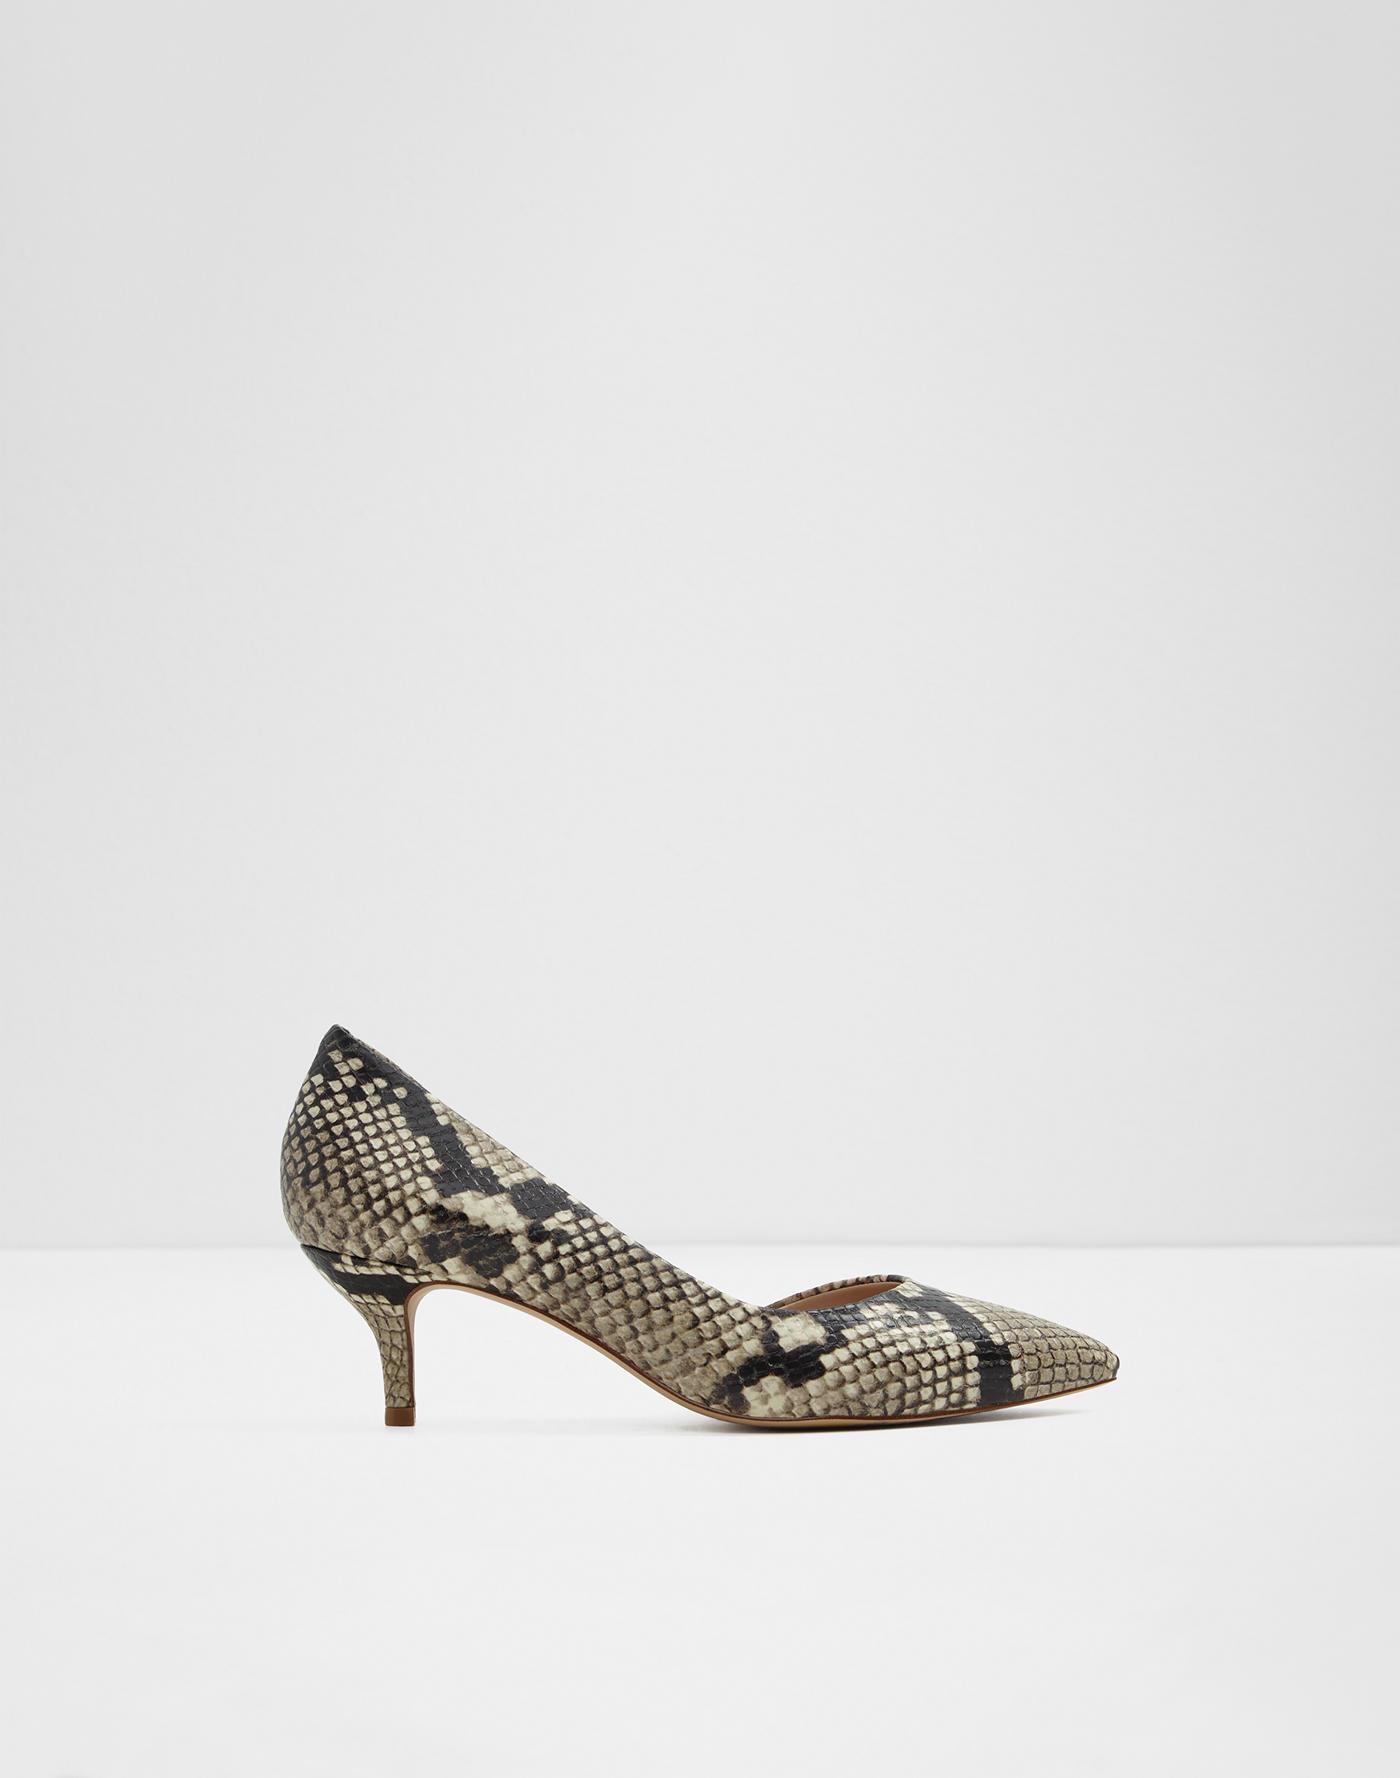 59b02beabf0 Nyderindra beige taupe main jpg 1400x1778 Mint green low heels